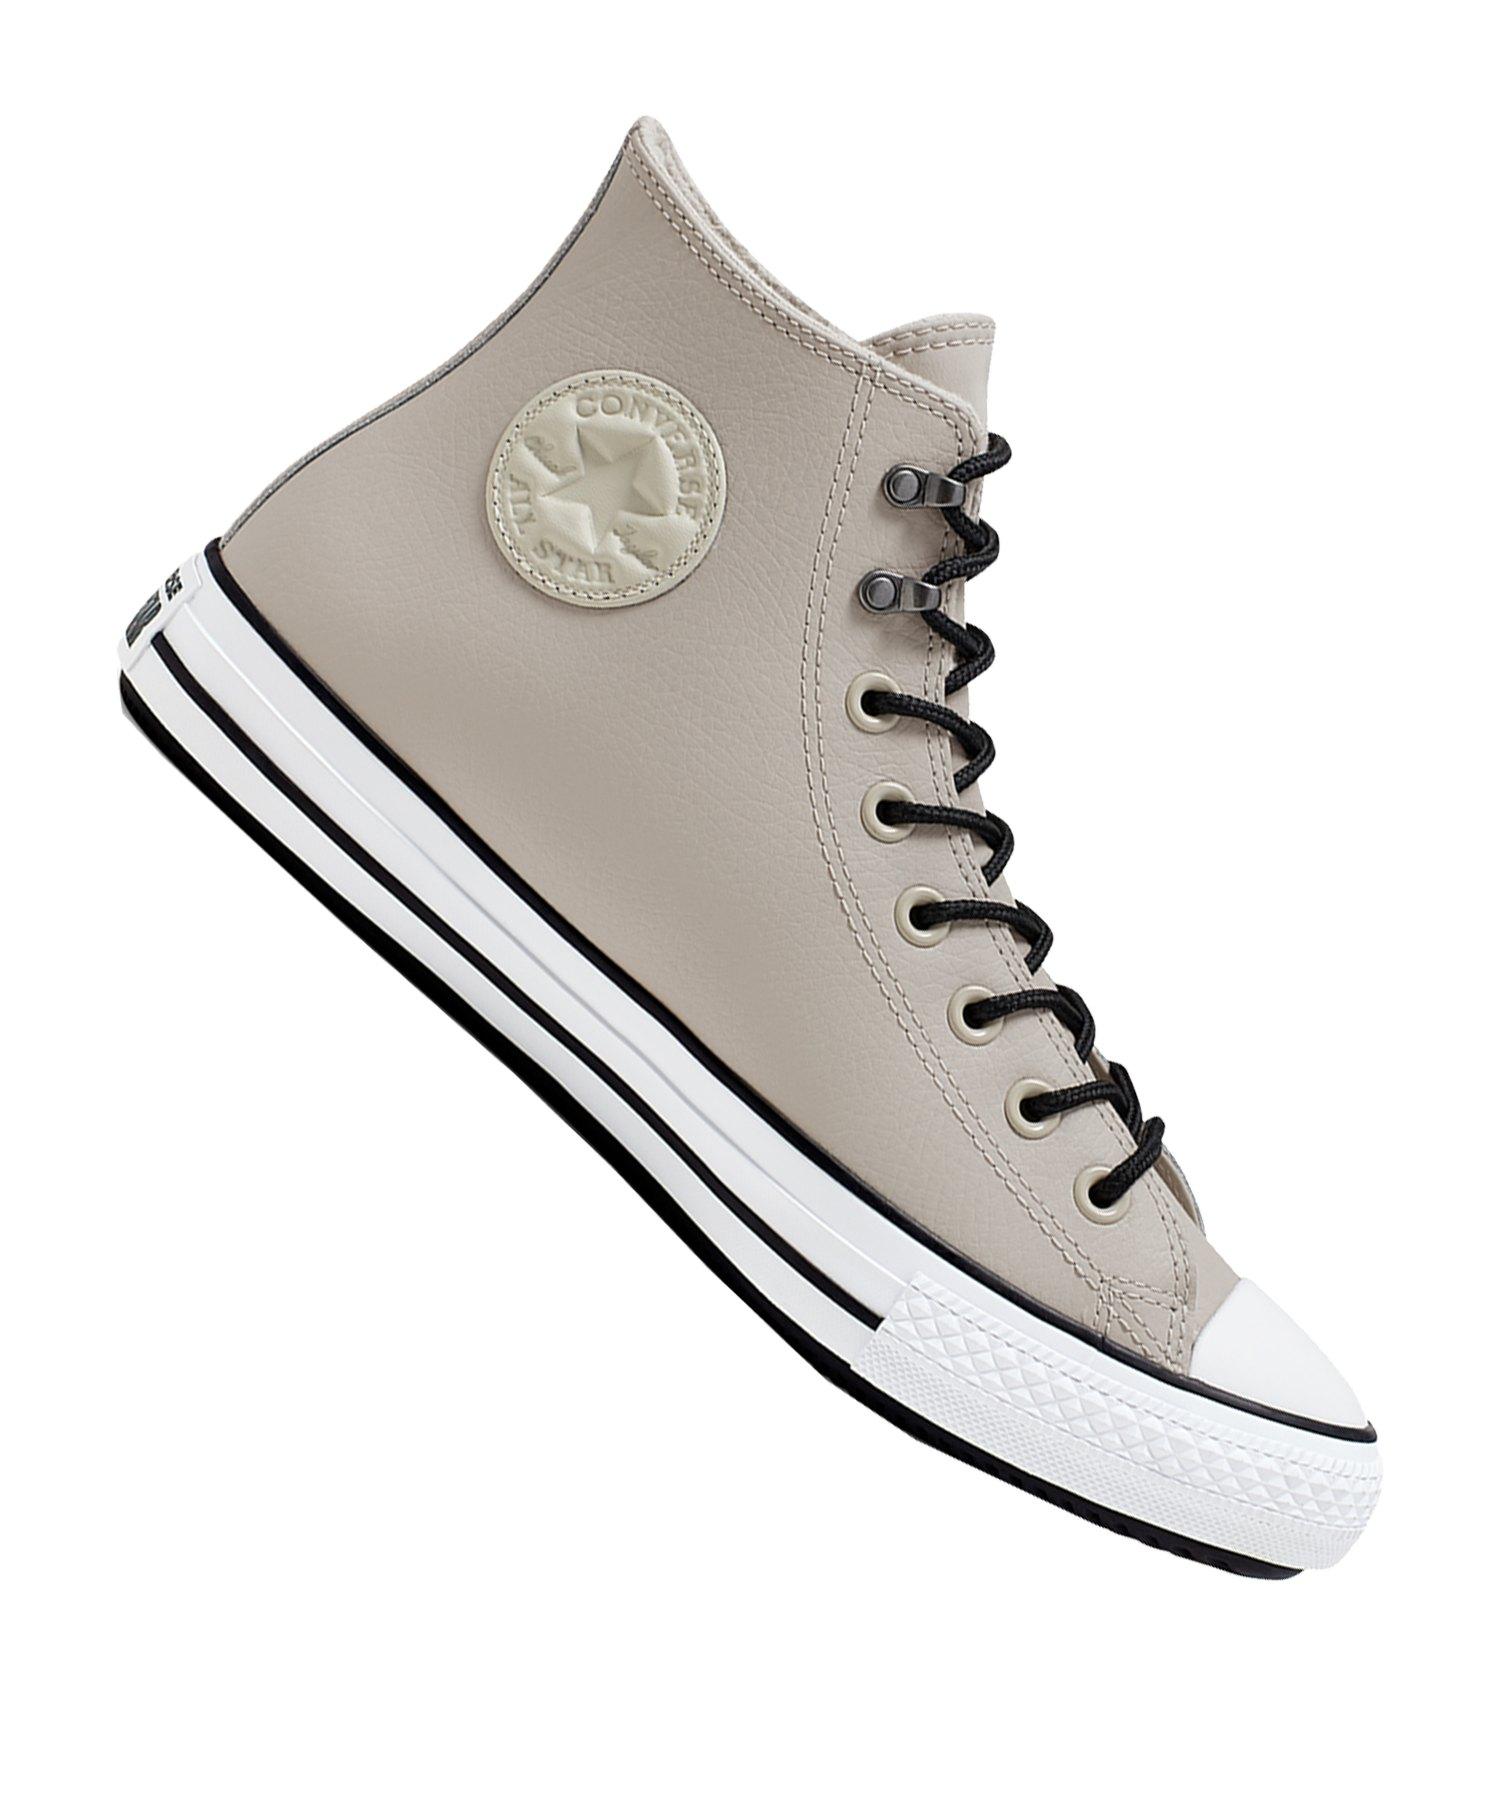 Converse Chuck Taylor AS Winter High Sneaker Beige - beige